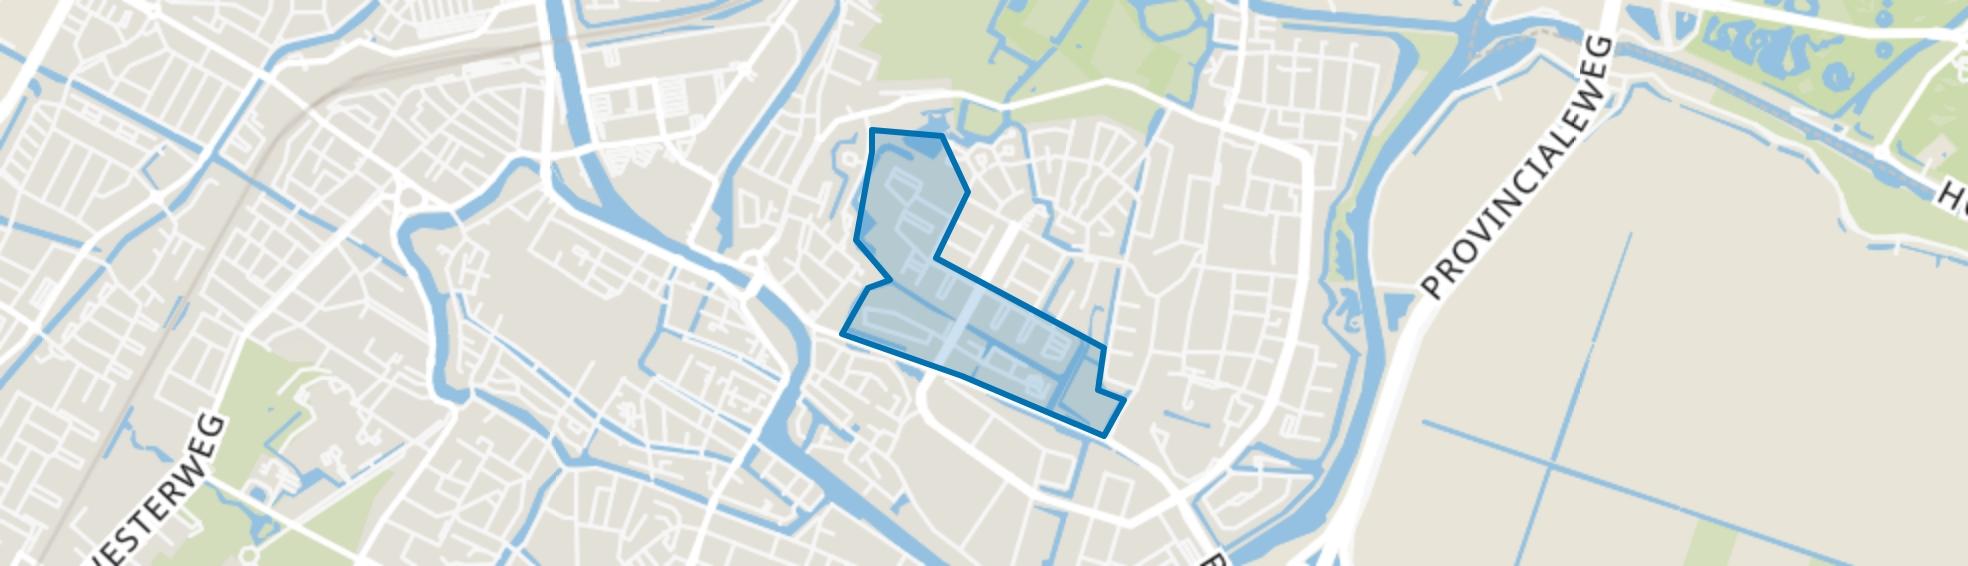 Oudorperpolder-Zuid, Alkmaar map